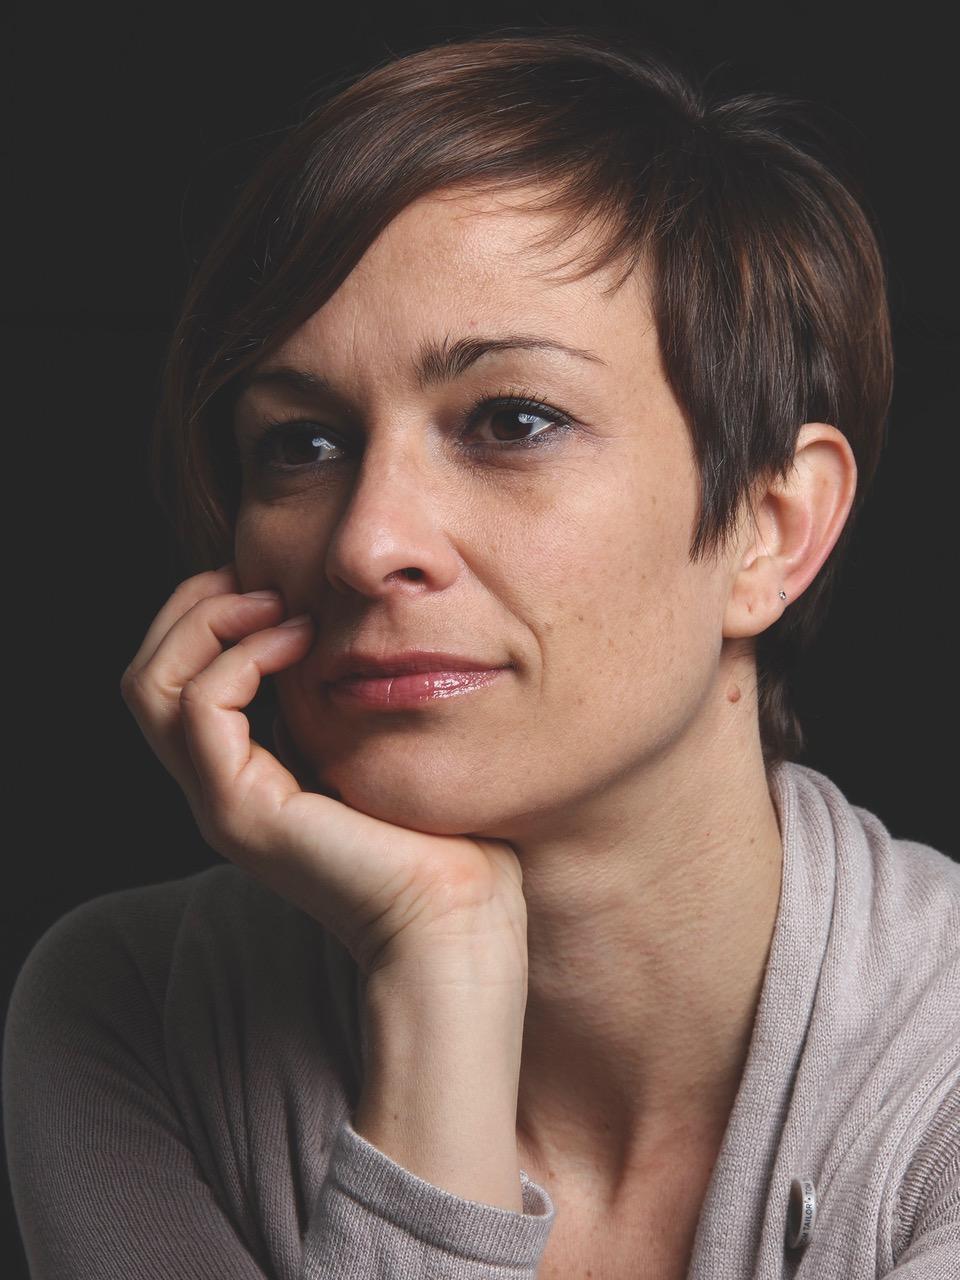 Apérofahrt mit Zuger Kulturpersönlichkeit: Seraina Sidler-Tall